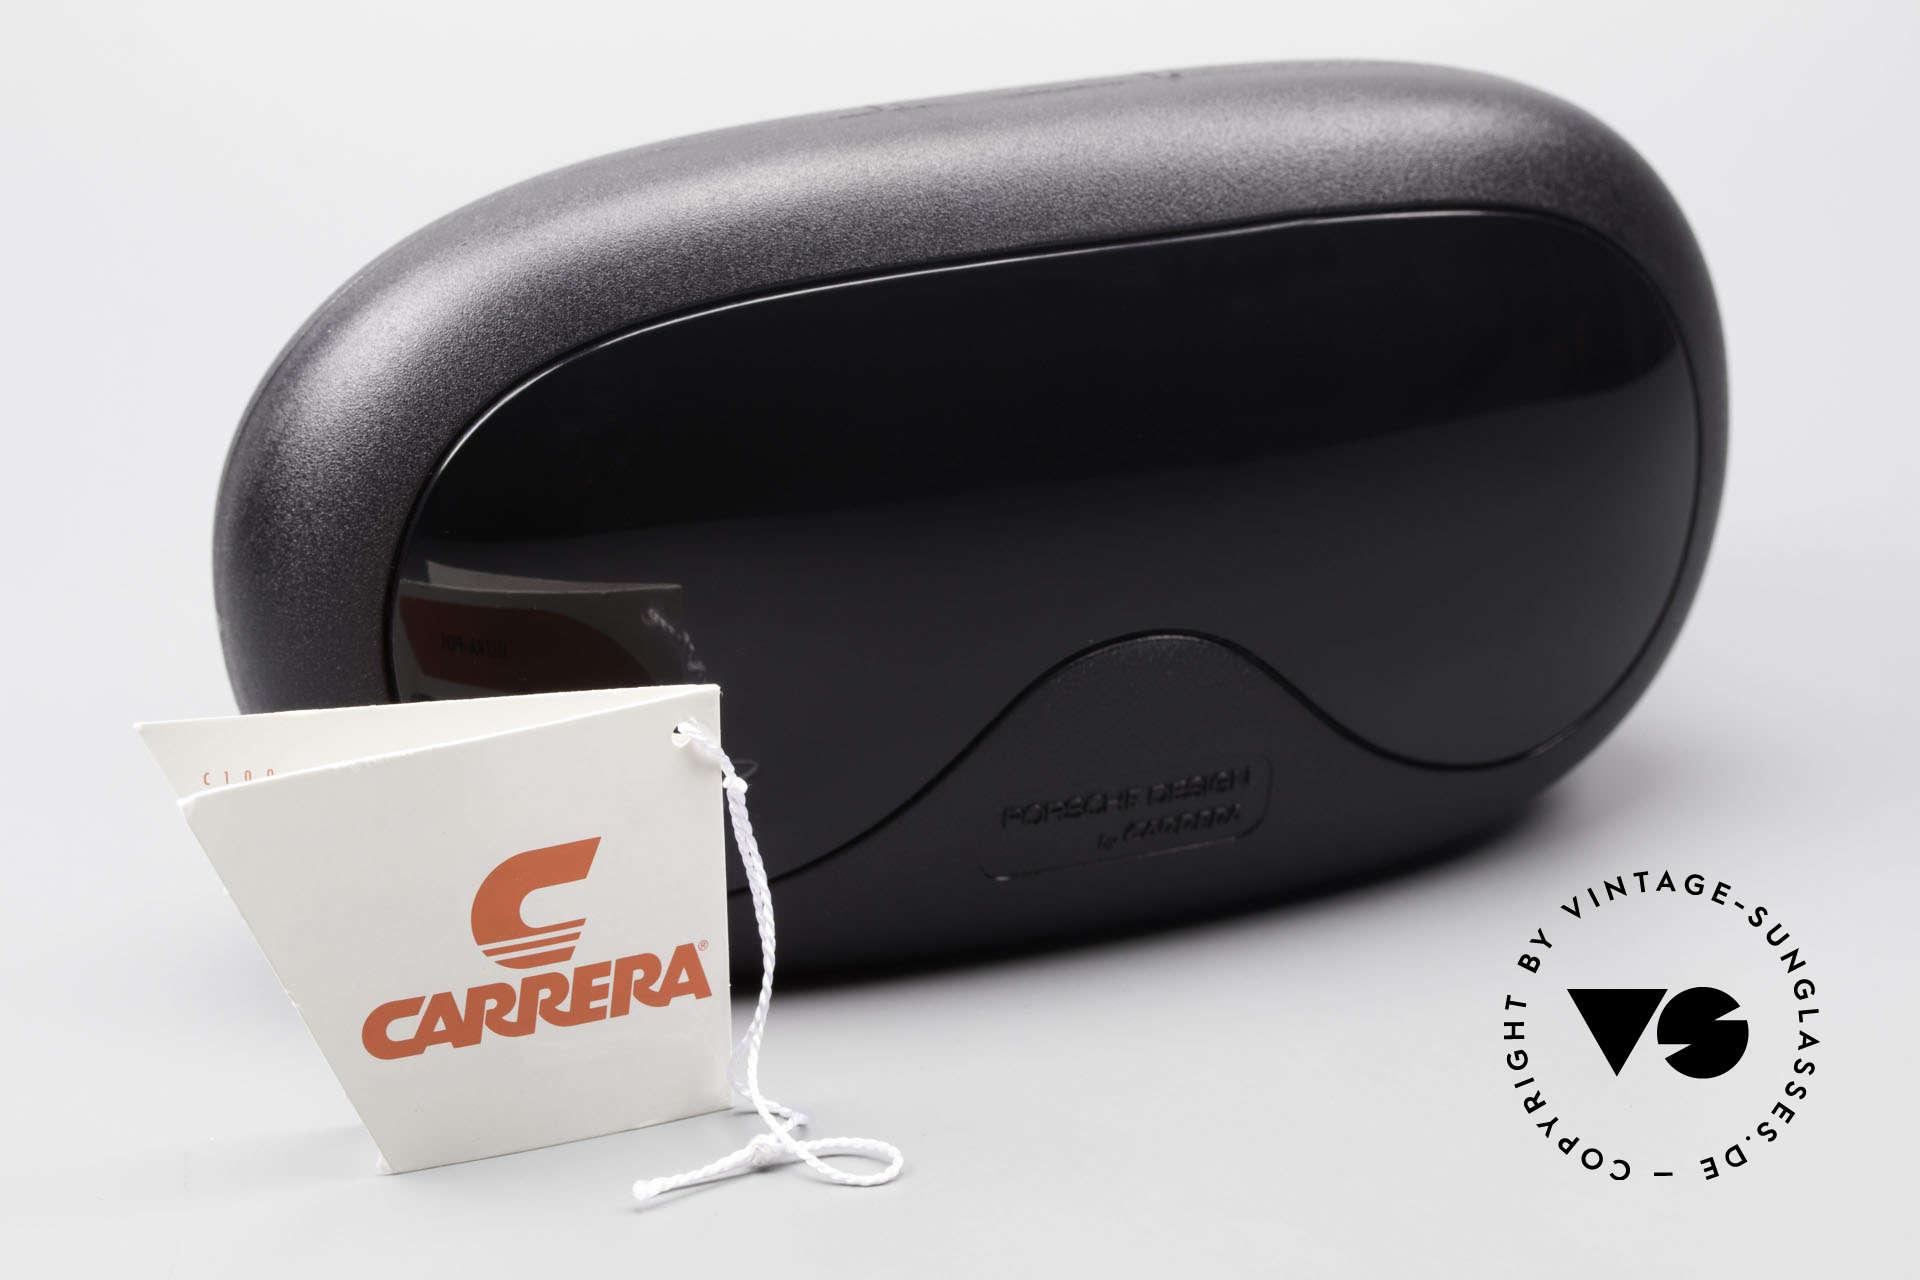 Carrera 5512 80's Sunglasses Miami Vice, Size: large, Made for Men